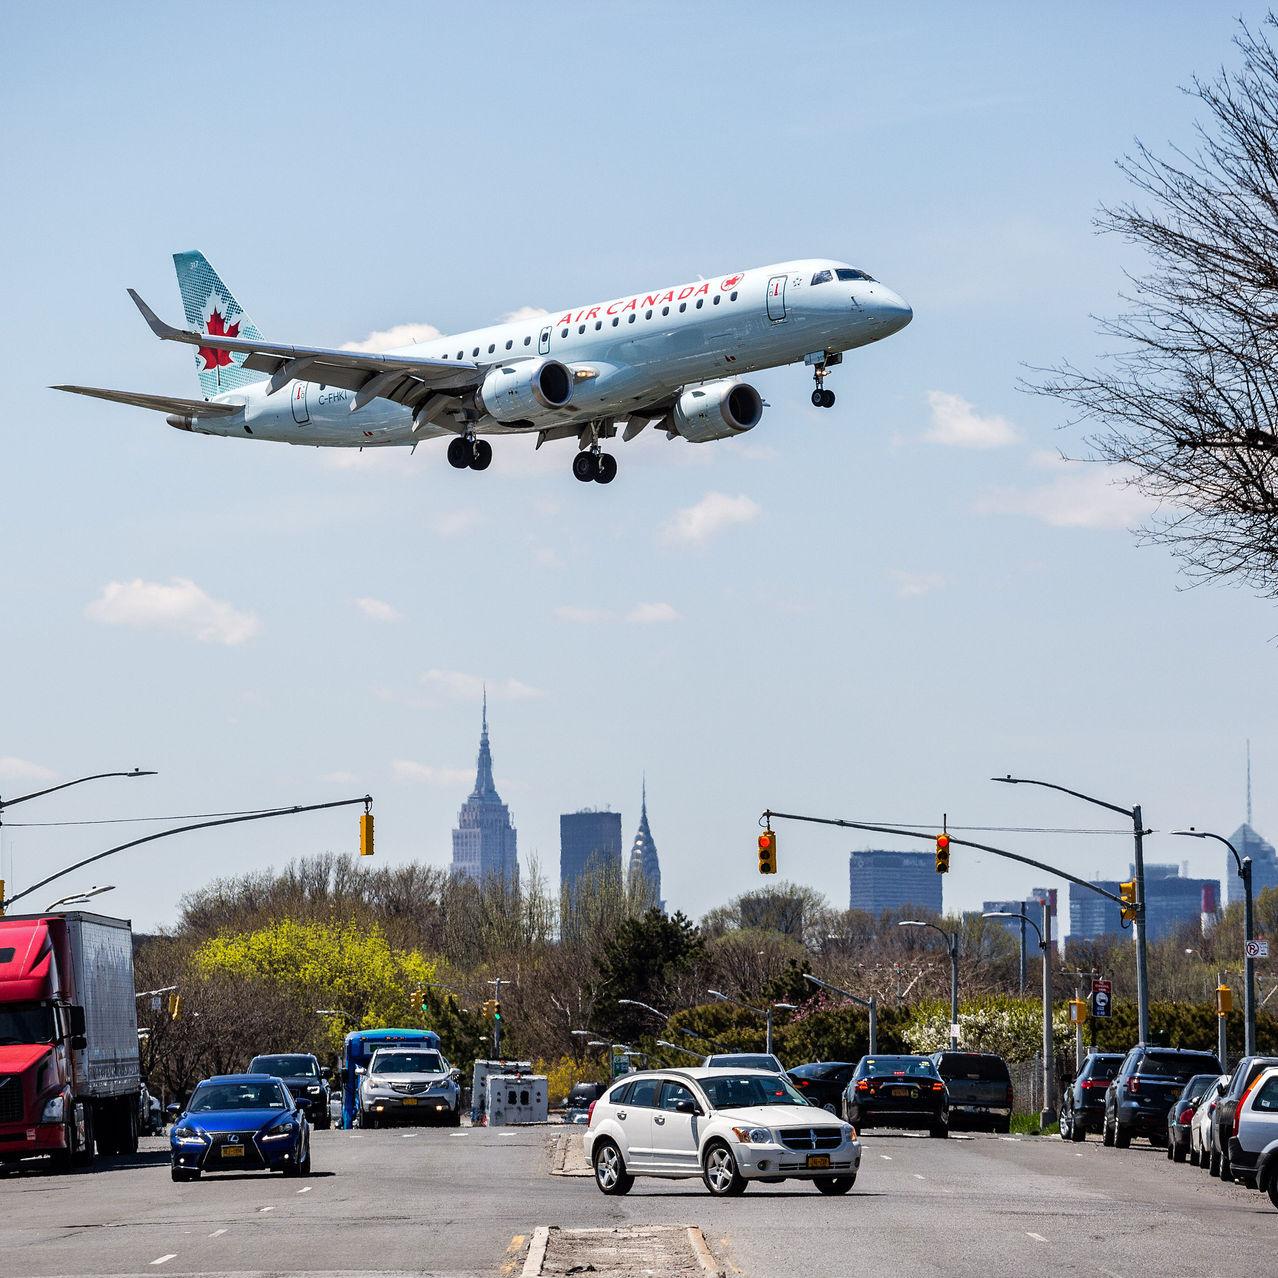 شرکت هواپیمایی ایر کانادا